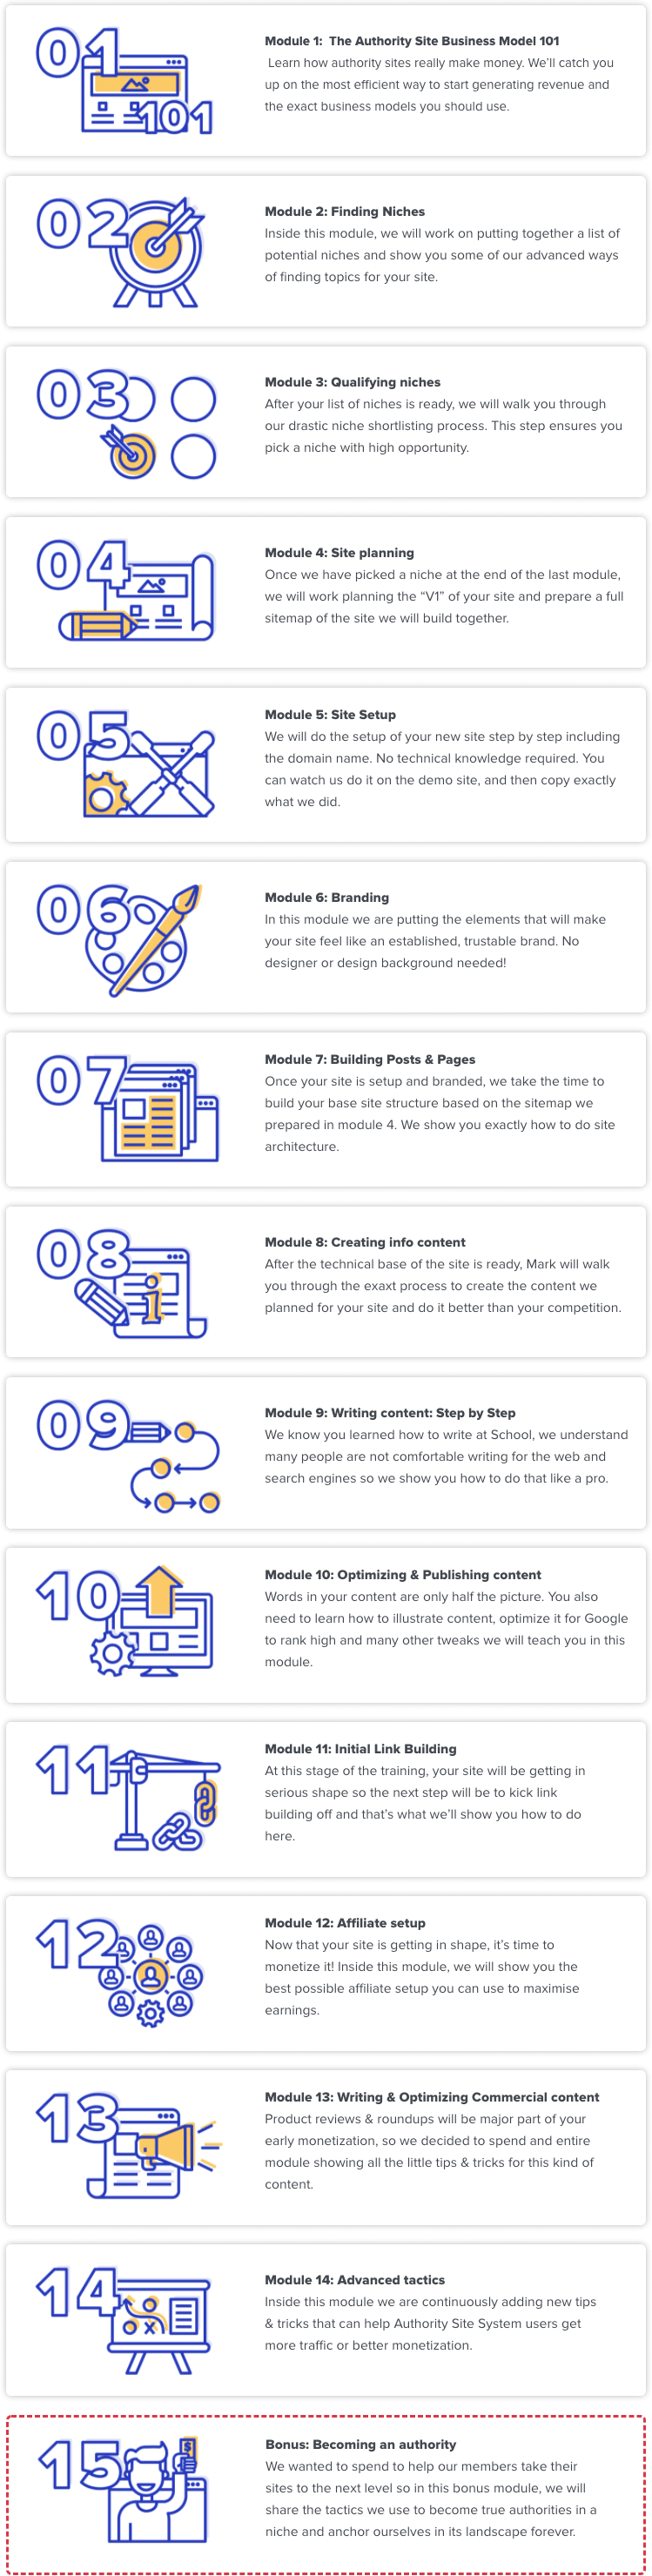 description of the 15 modules